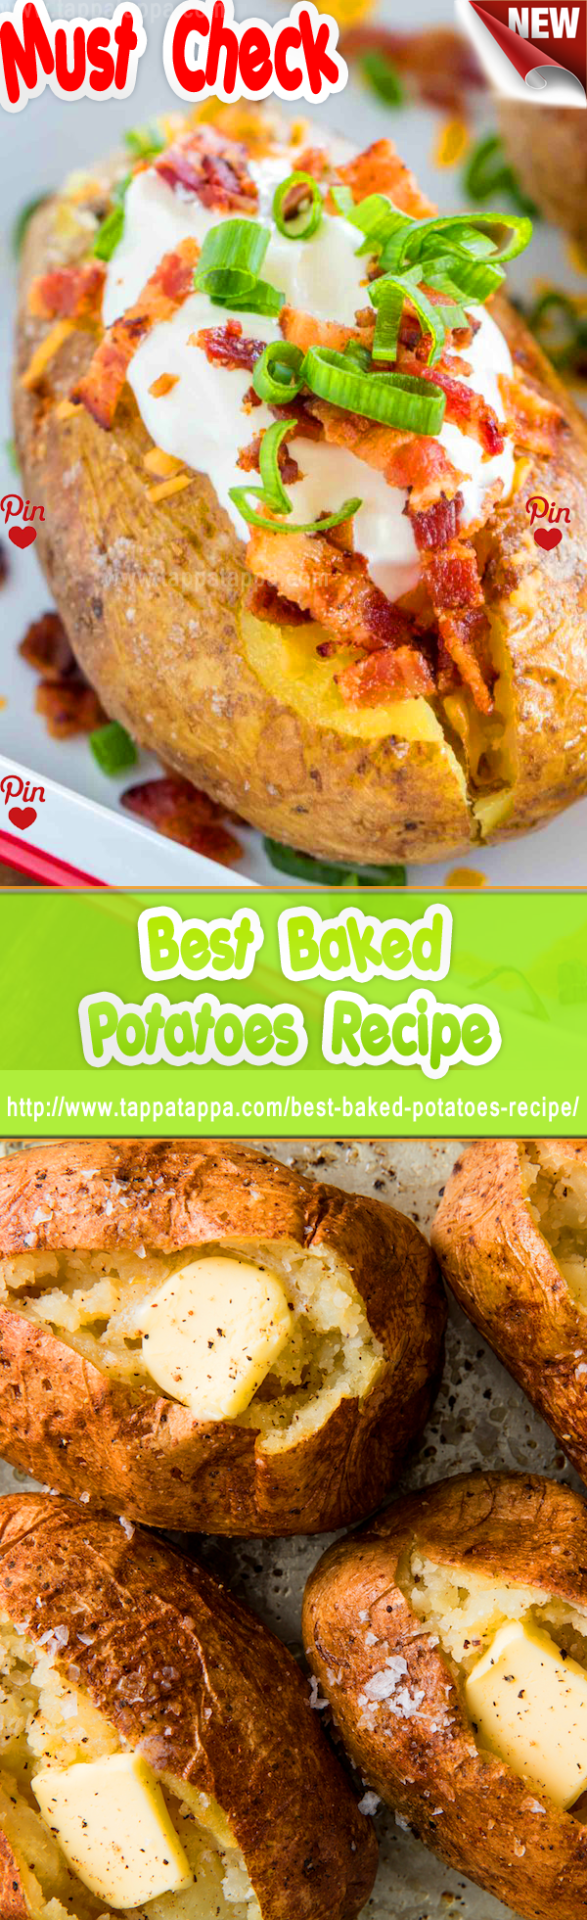 Bestes Bratkartoffelrezept Zubereitungszeit: 5 Minuten Kochzeit: 45 Minuten Ausbeute: ... #russetpotatorecipes